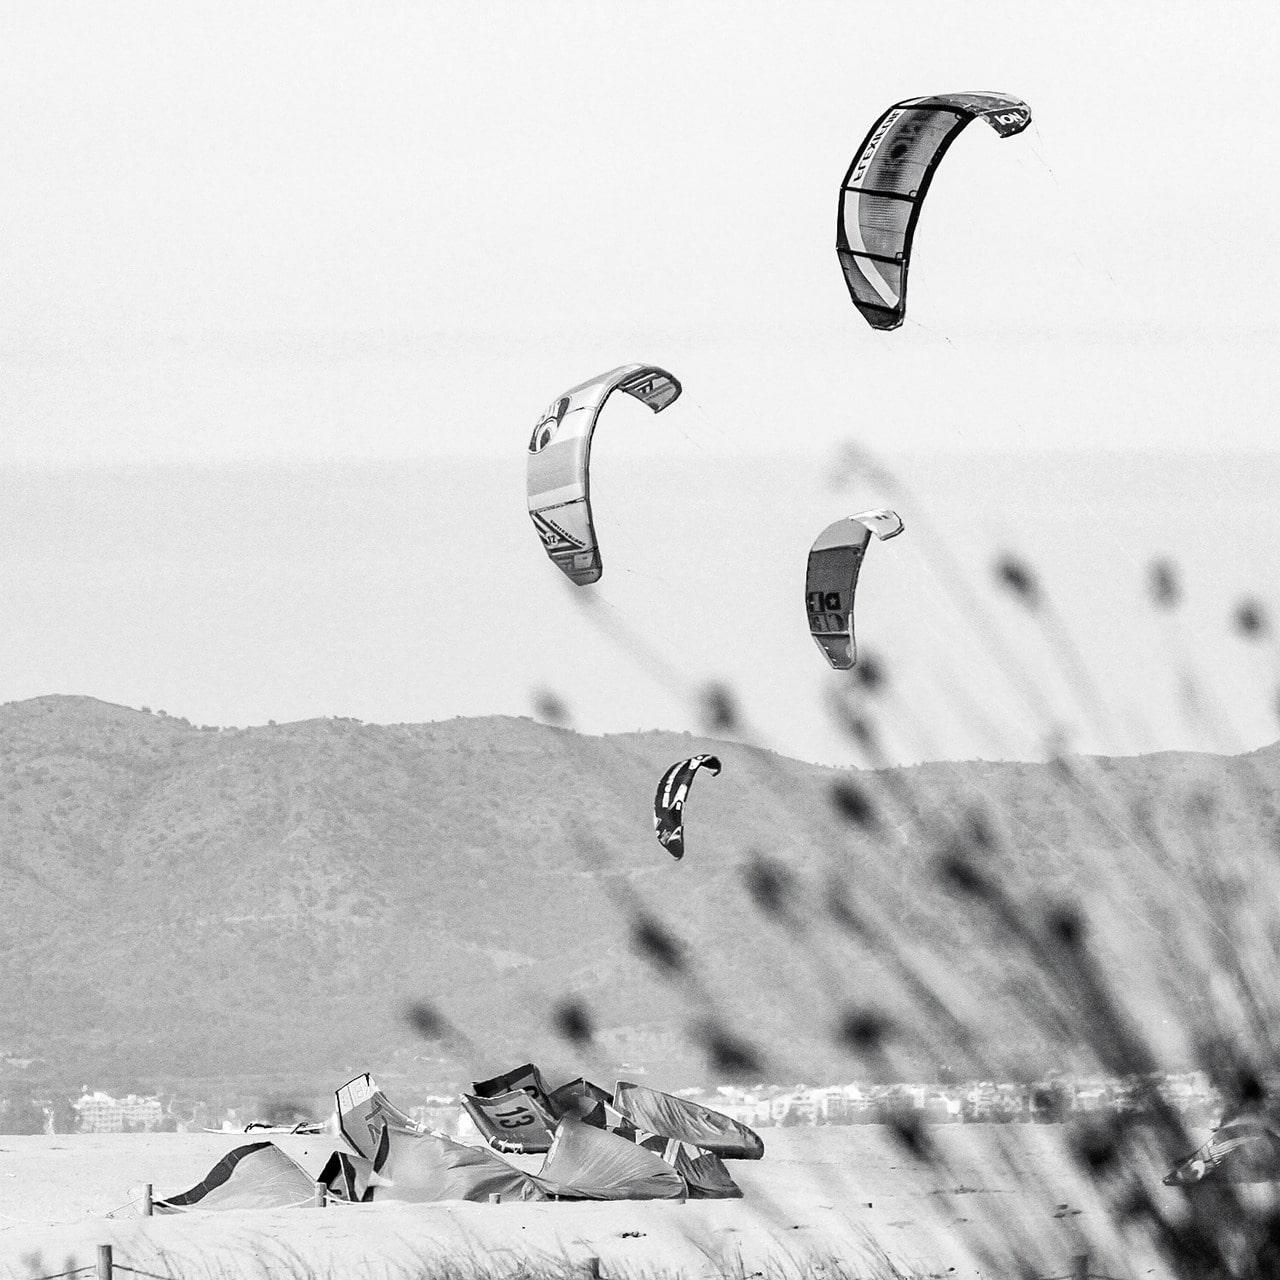 san-pere-pescador-kitesurf